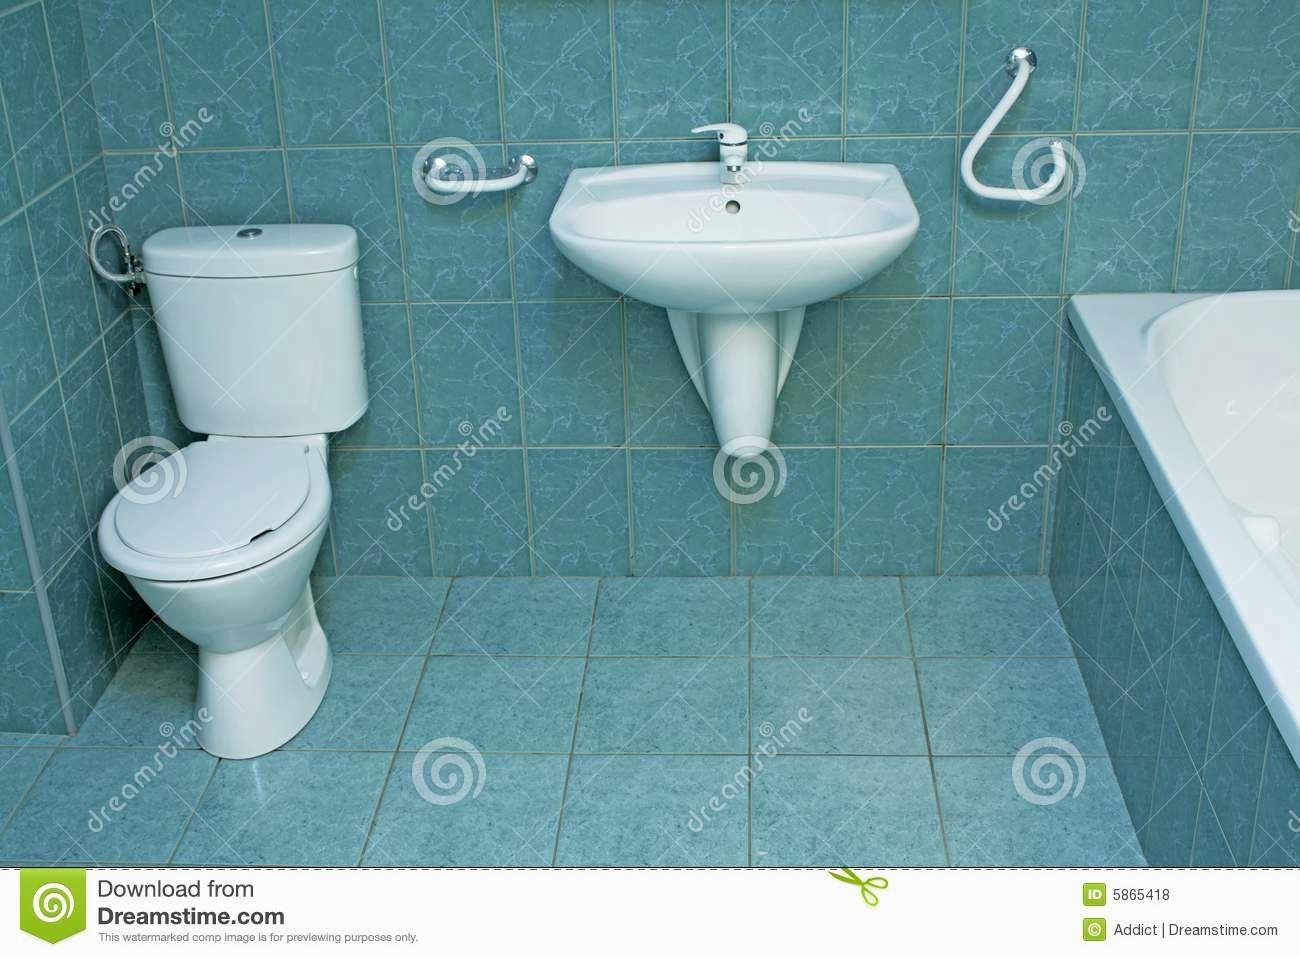 Wonderful How to Tile A Bathroom Shower Wallpaper | Bathroom Design ...